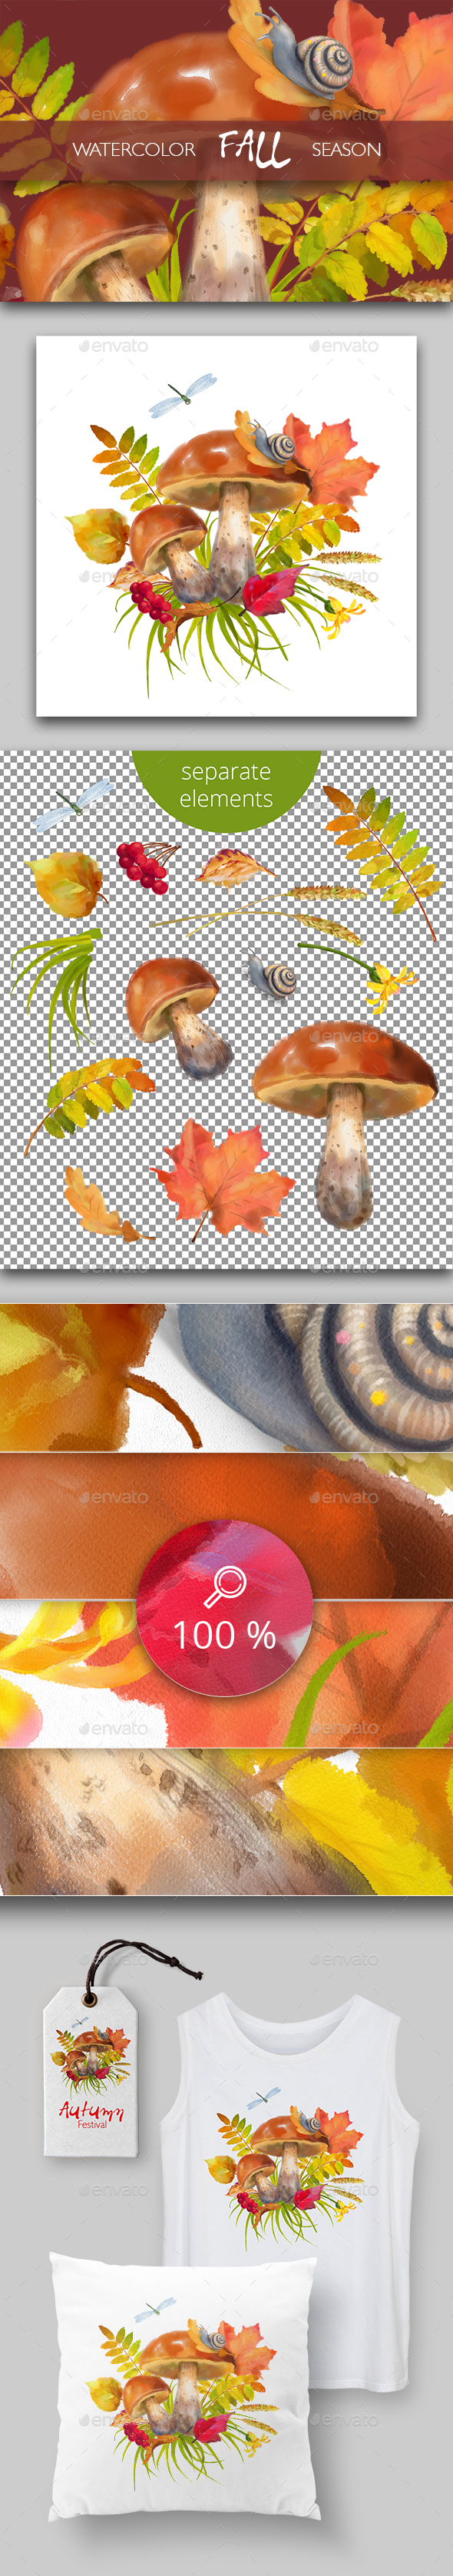 Watercolor Autumn - Scenes Illustrations